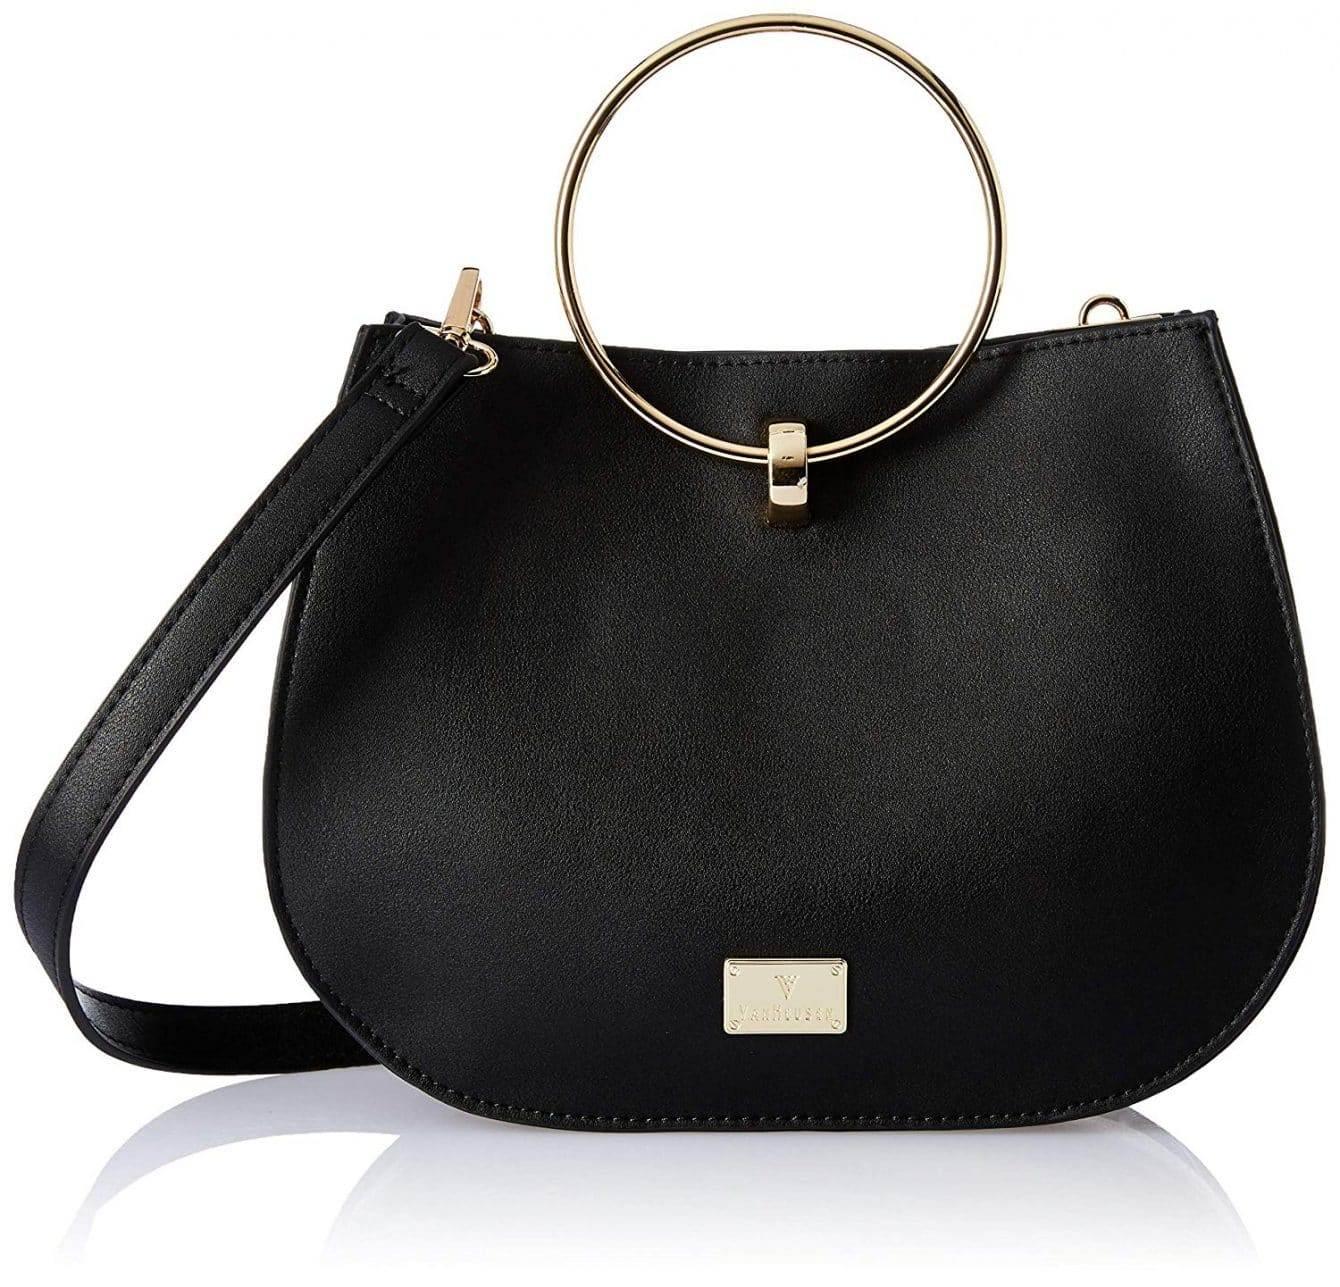 vintage inspired handbags